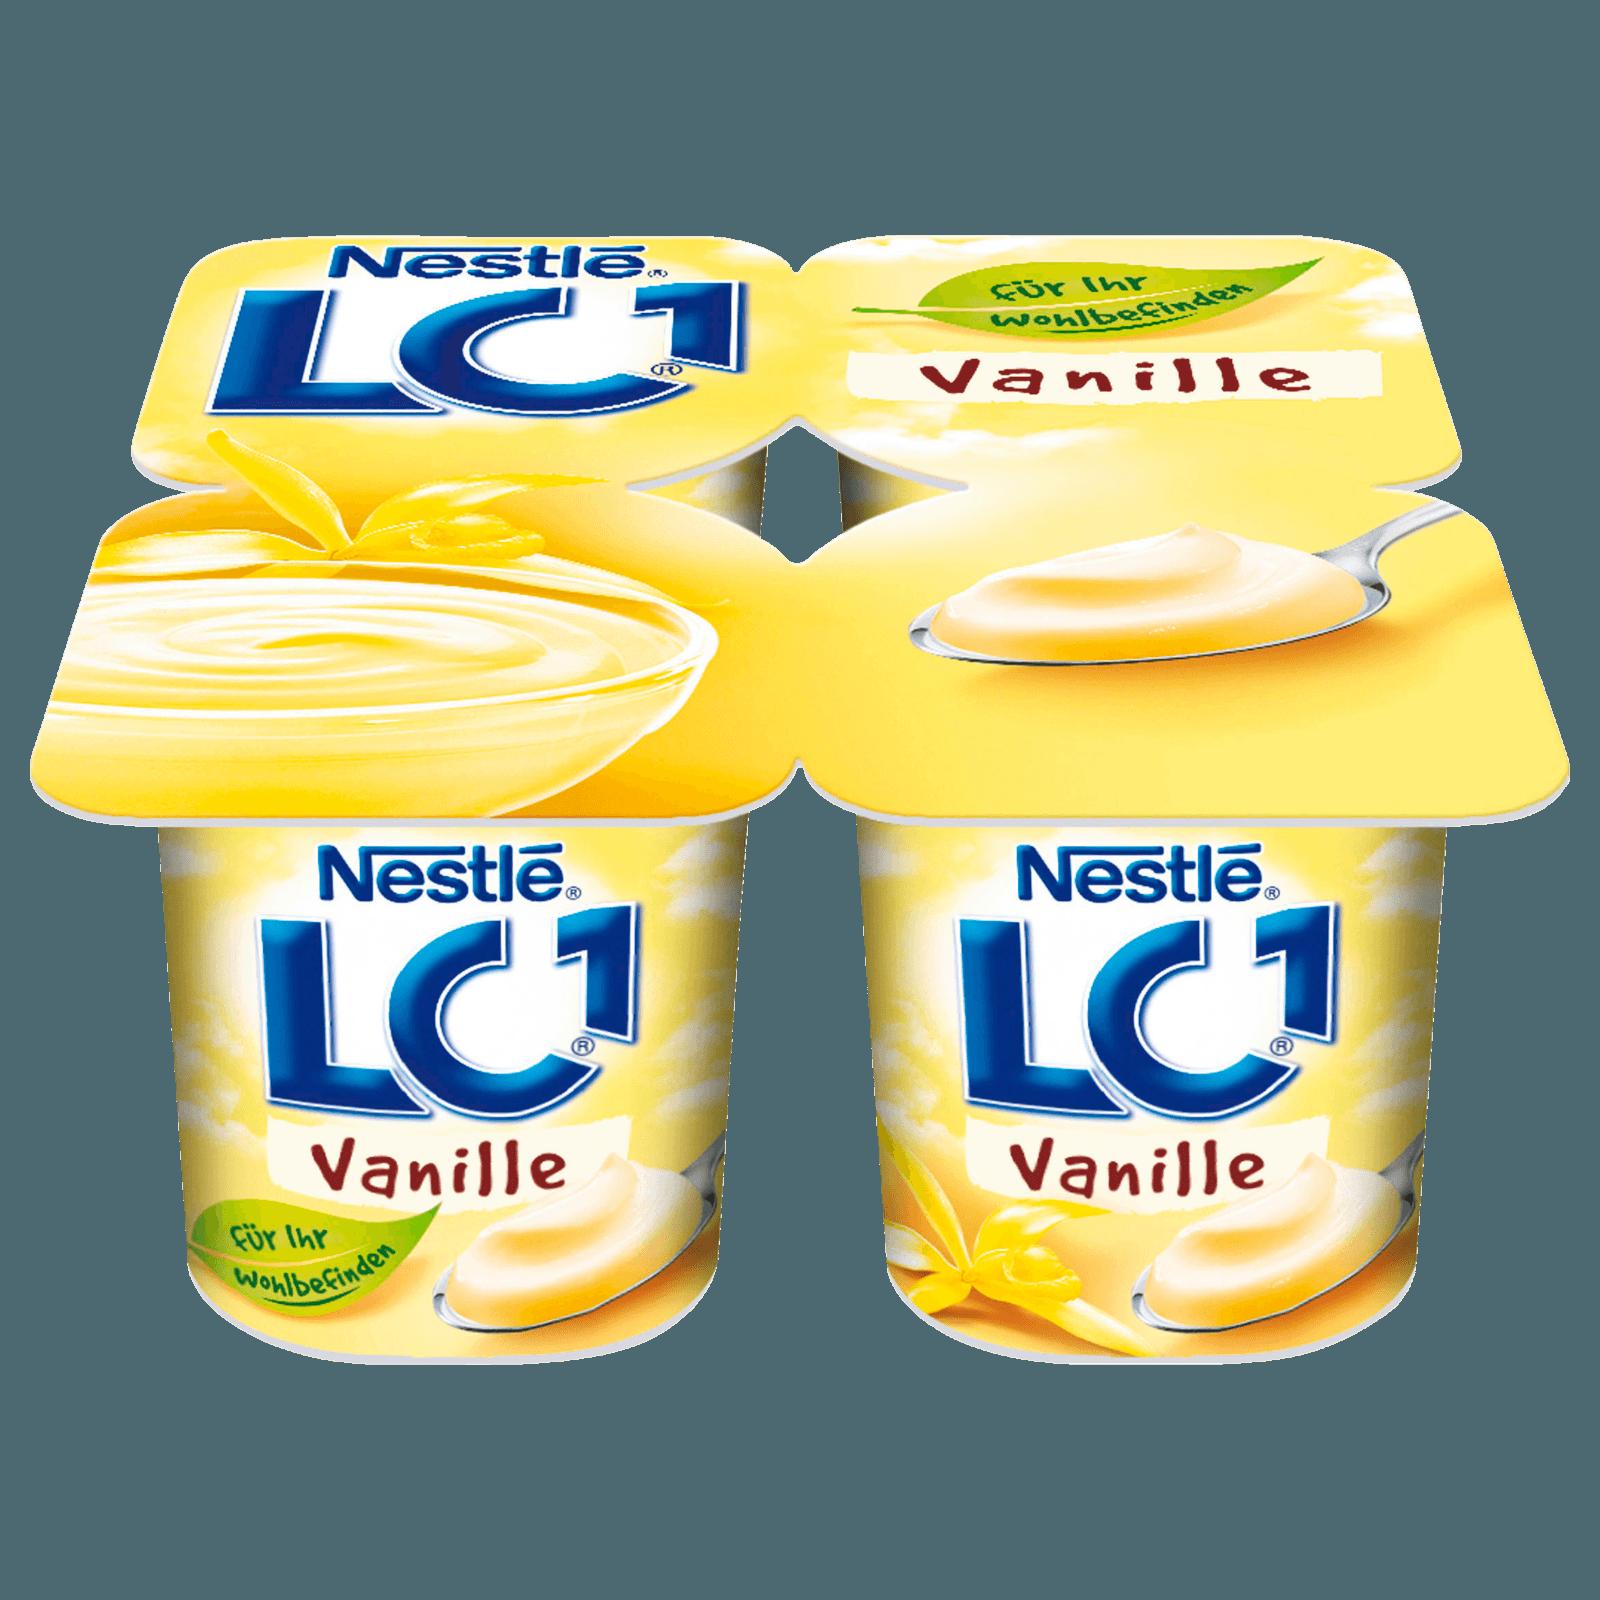 Nestlé LC1 Vanille 4x125g